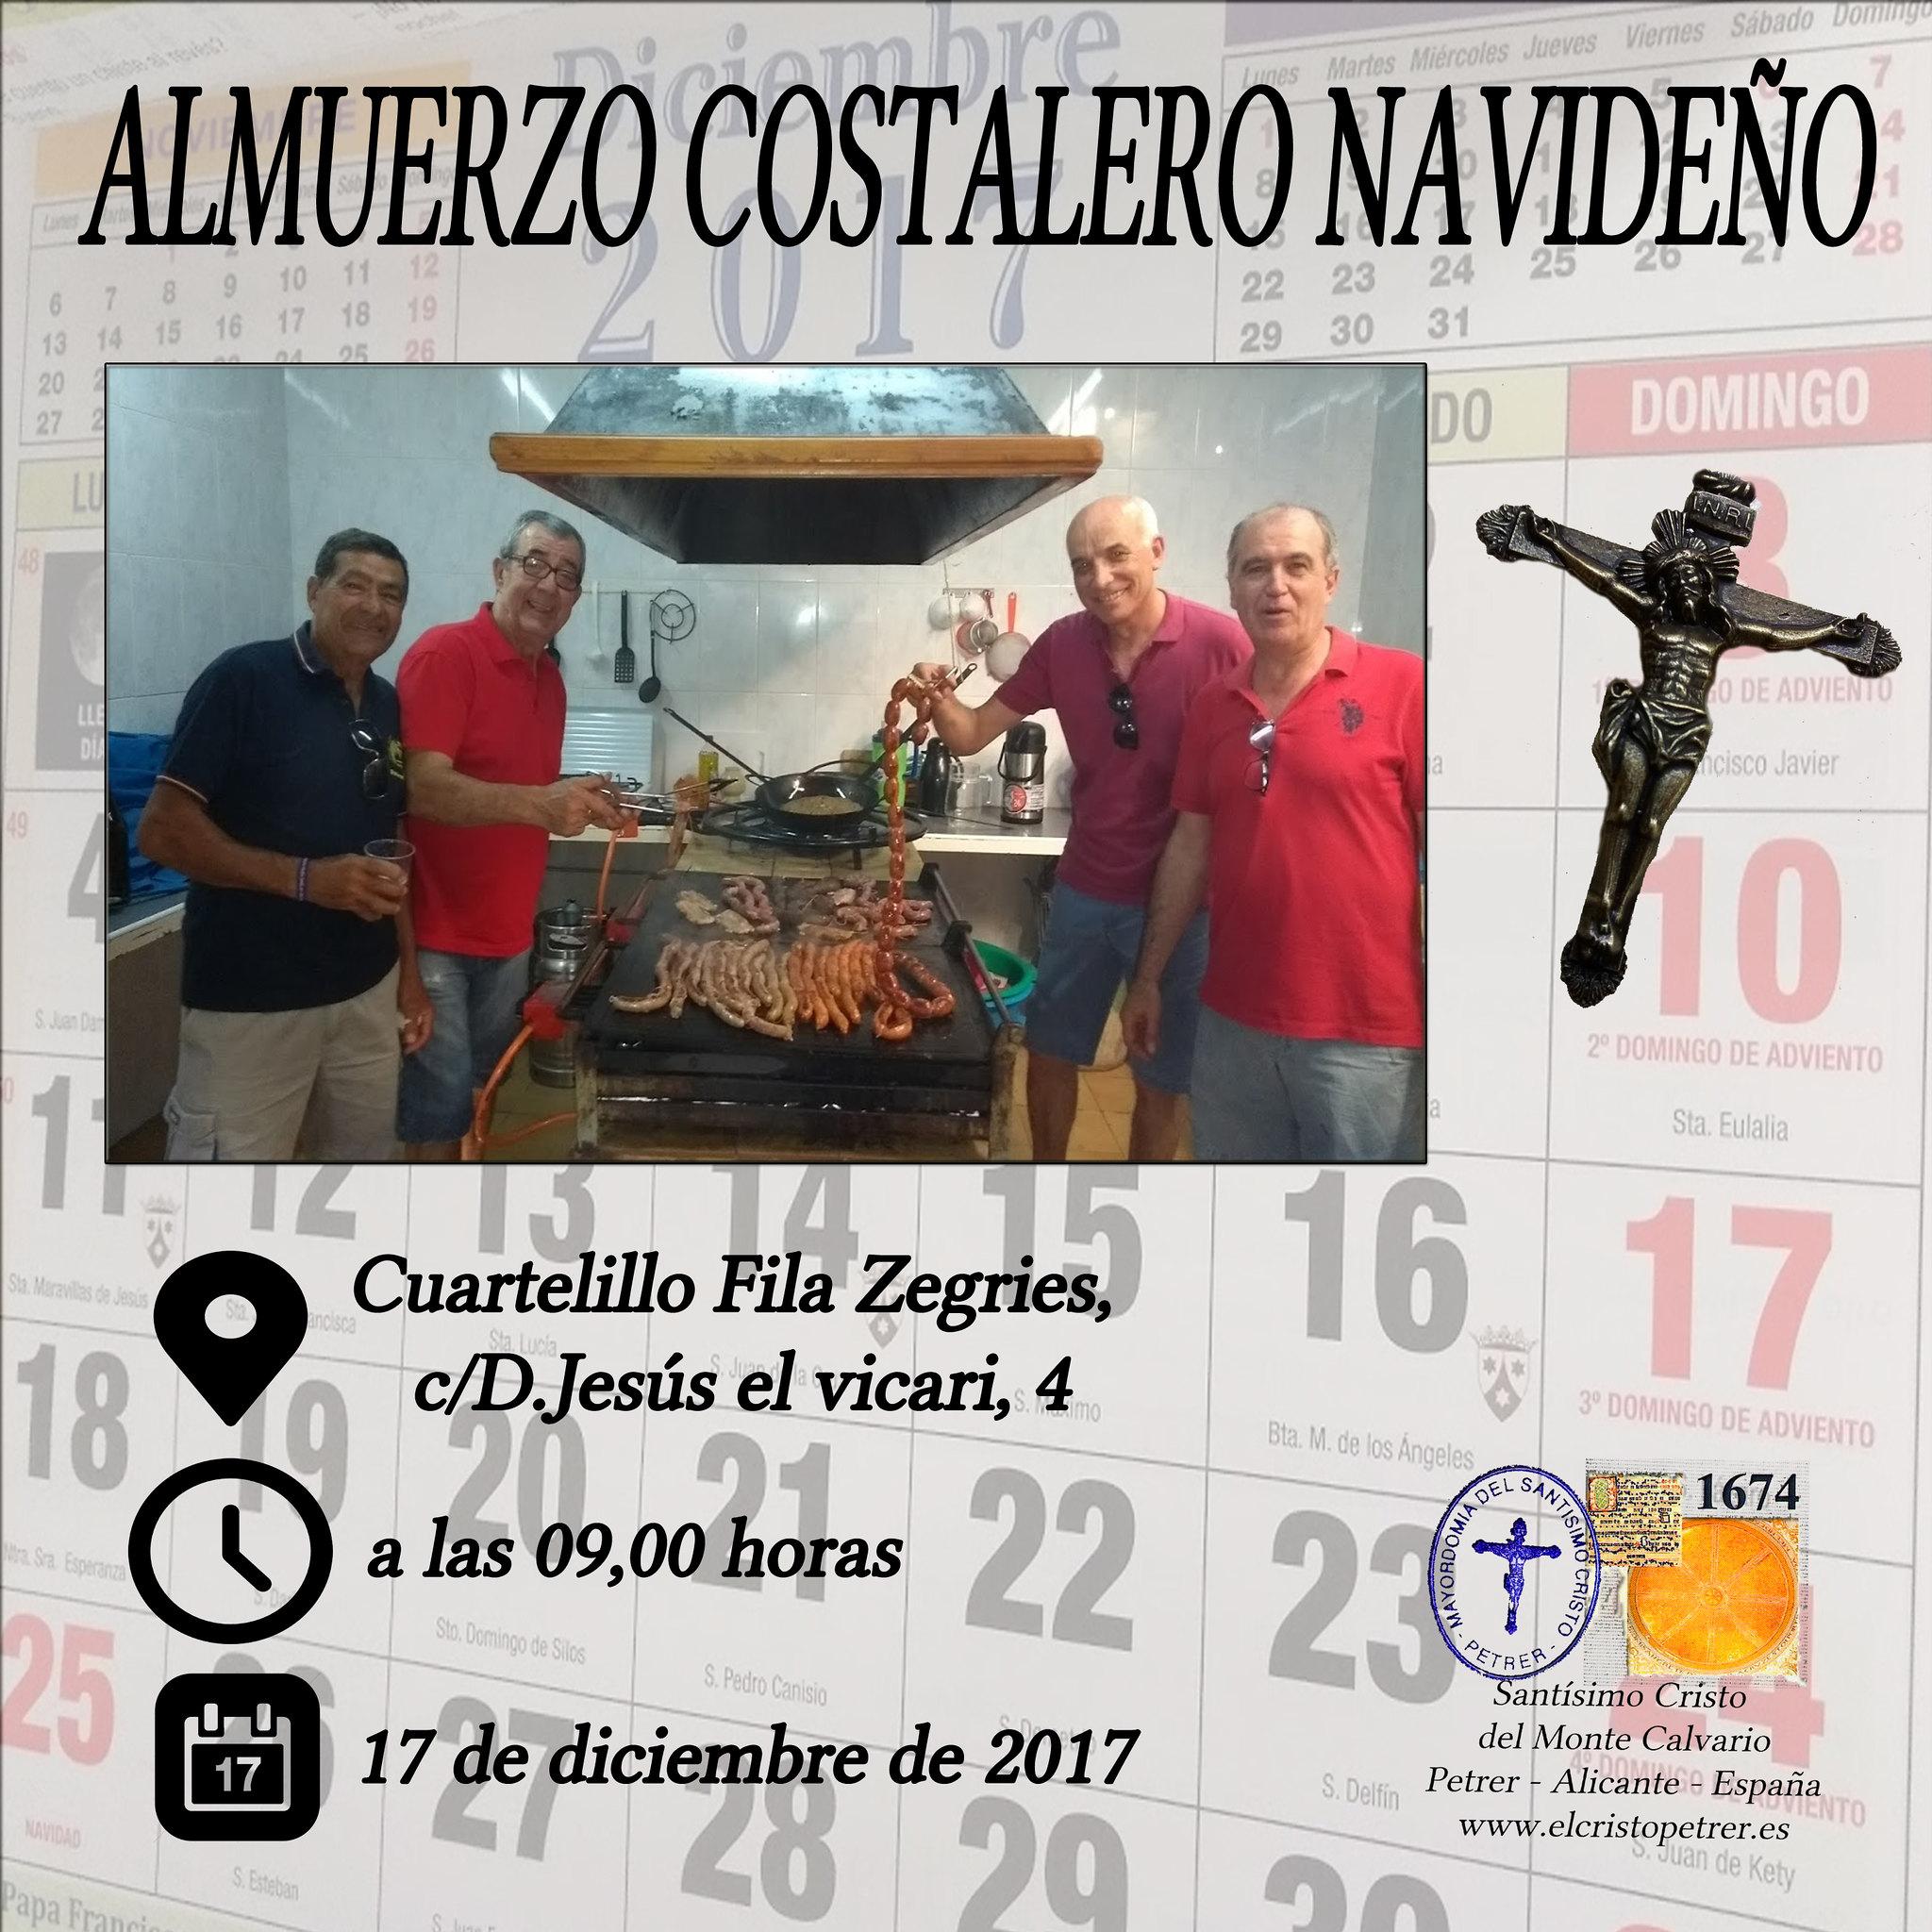 (2017-12-17) Almuerzo Costalero Navideño - José Vicente Romero Ripoll (00)